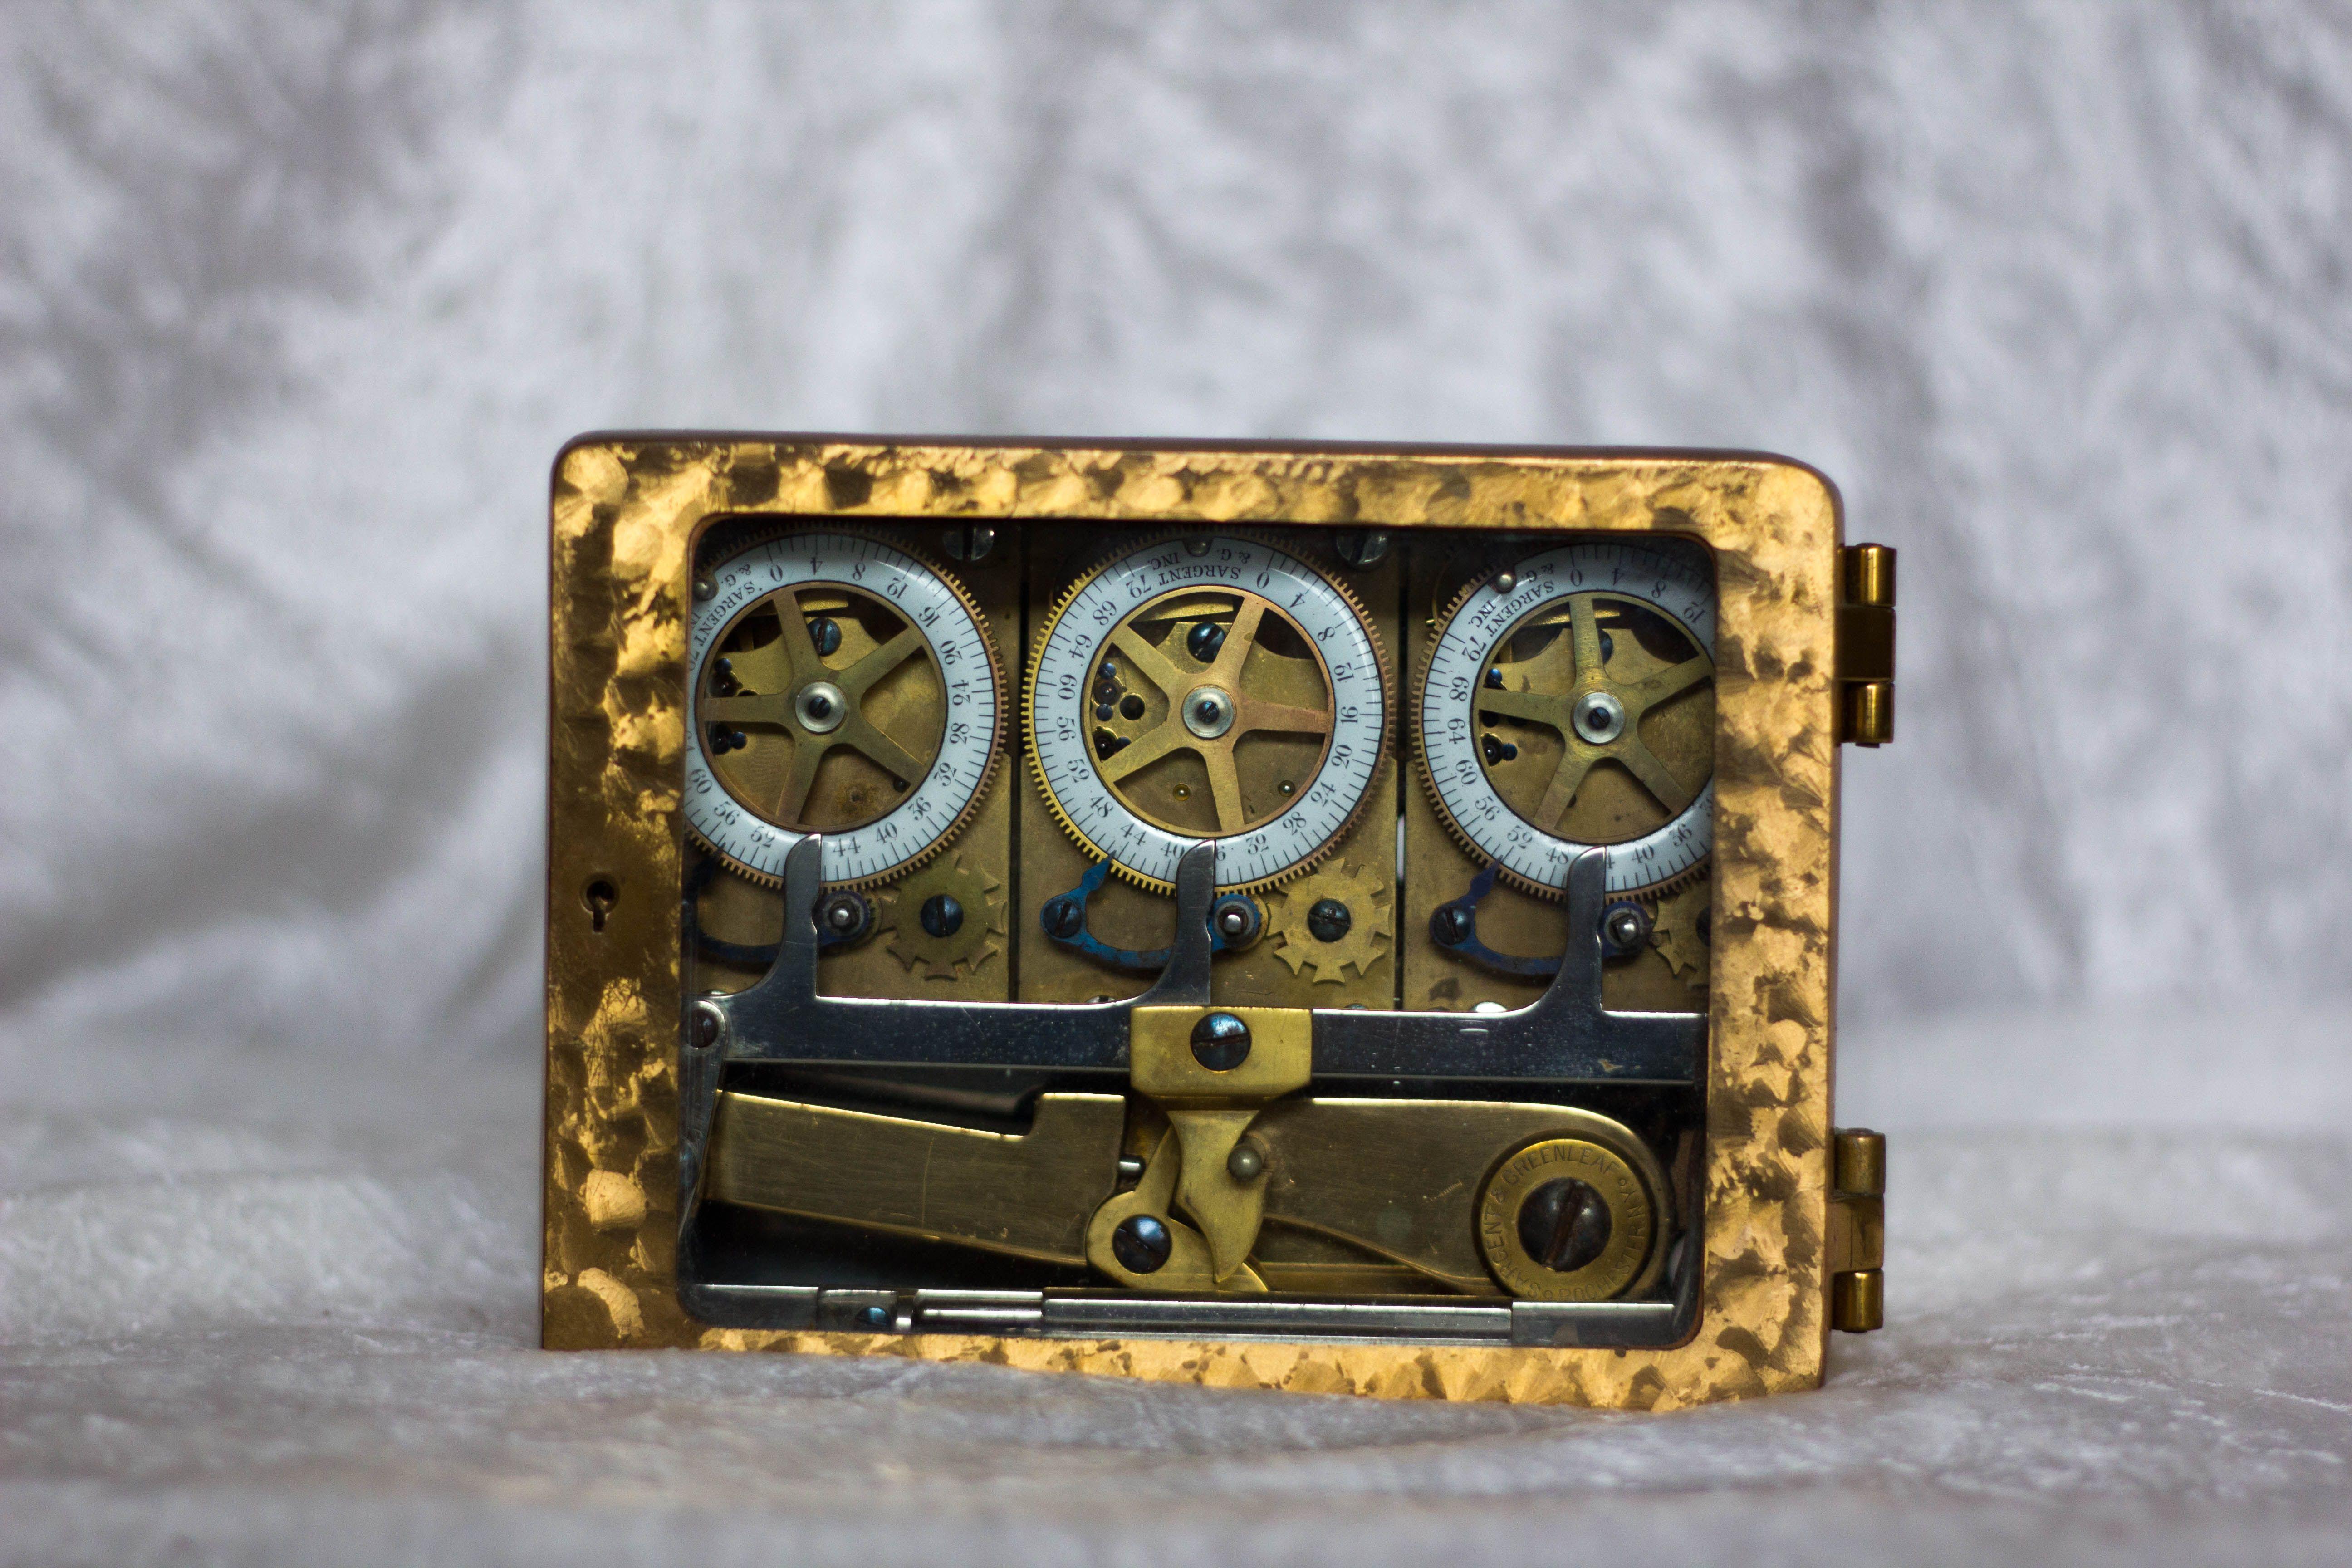 Sargeant U0026 Greenleaf Rochester, NY Triple Clock For Vault